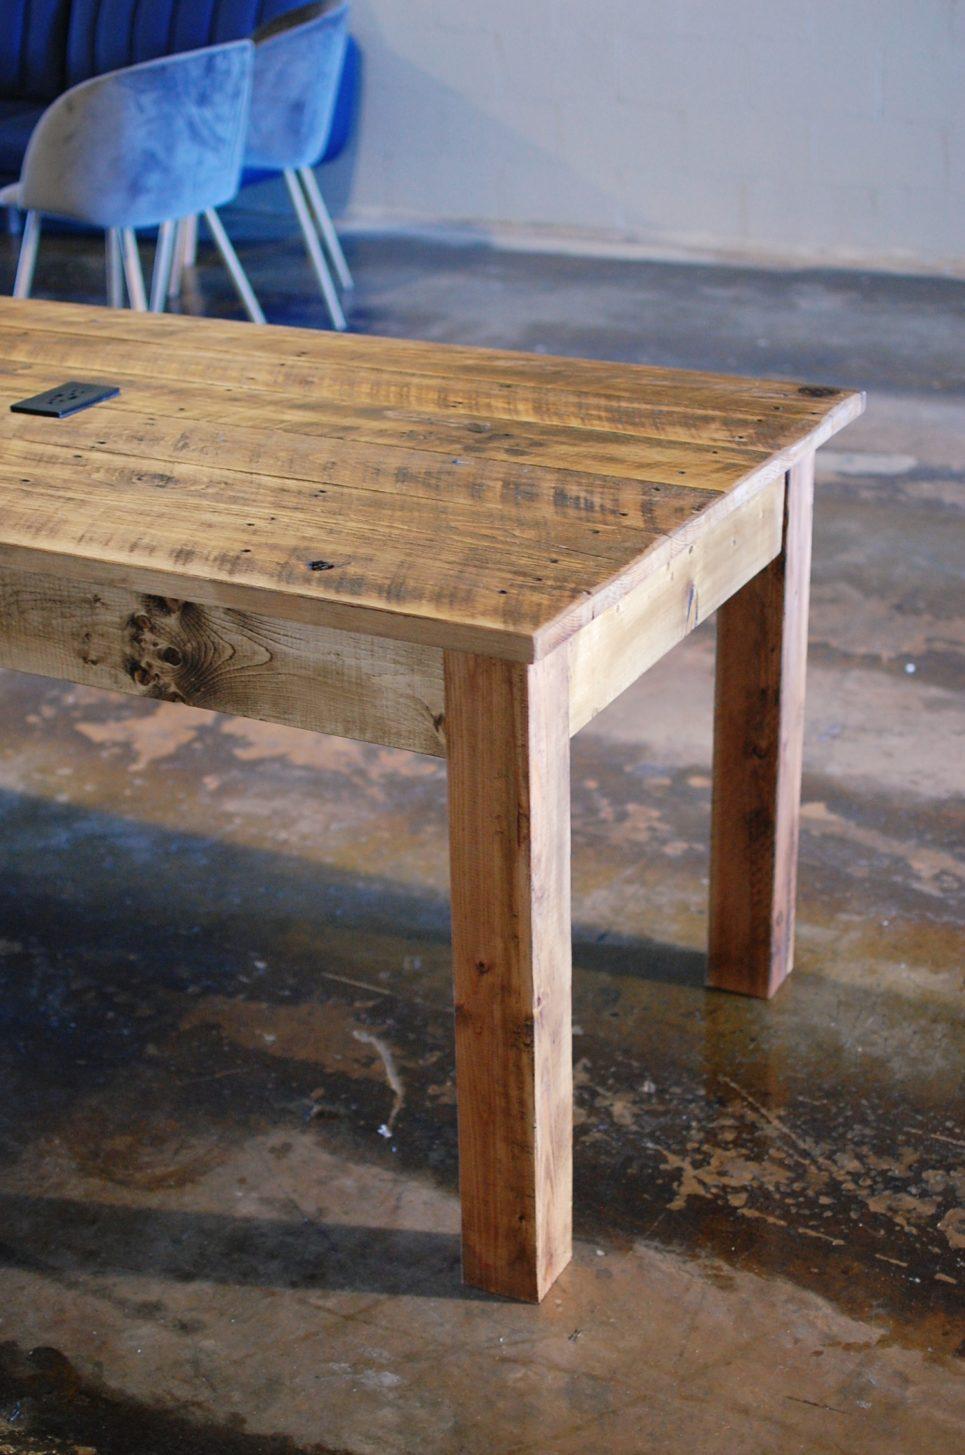 Ezekiel Wood Table with USB Charging Station